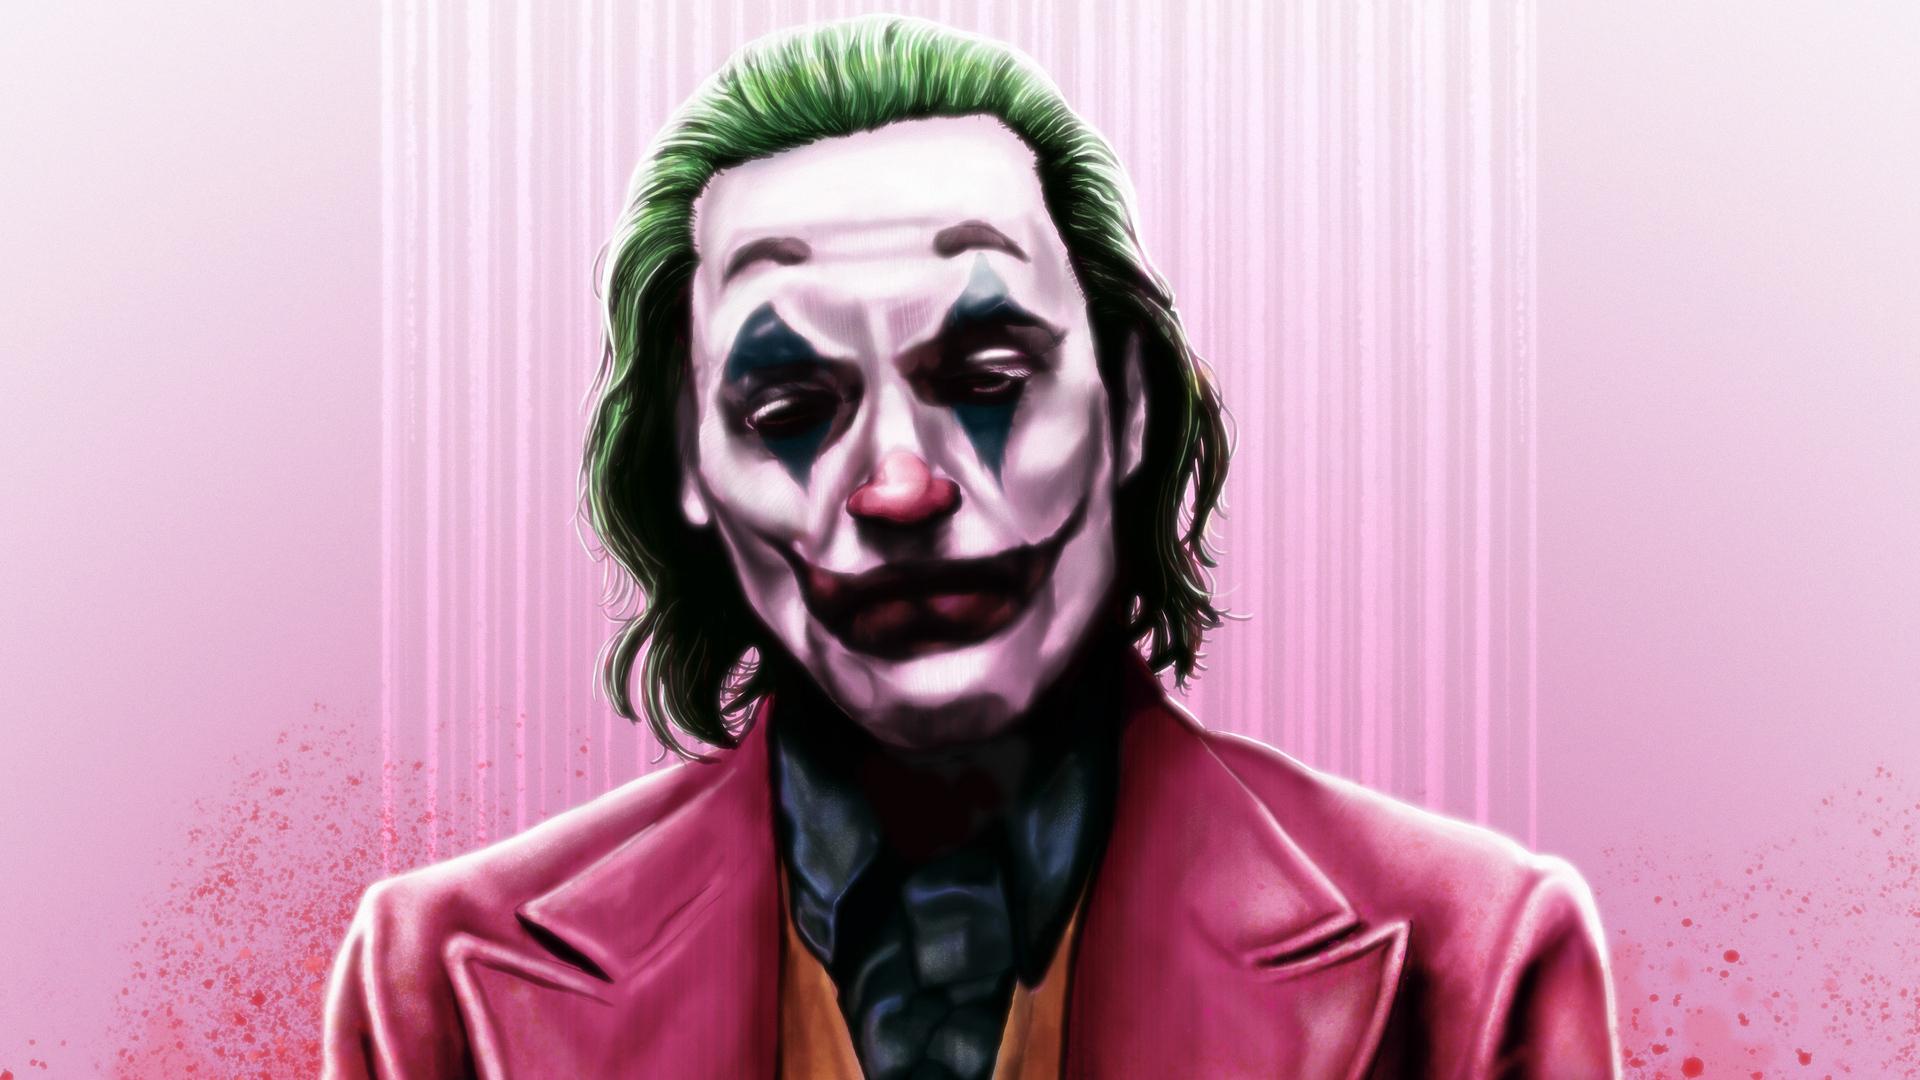 1920x1080 Joker Joaquin Phoenix 4k Art Laptop Full Hd 1080p